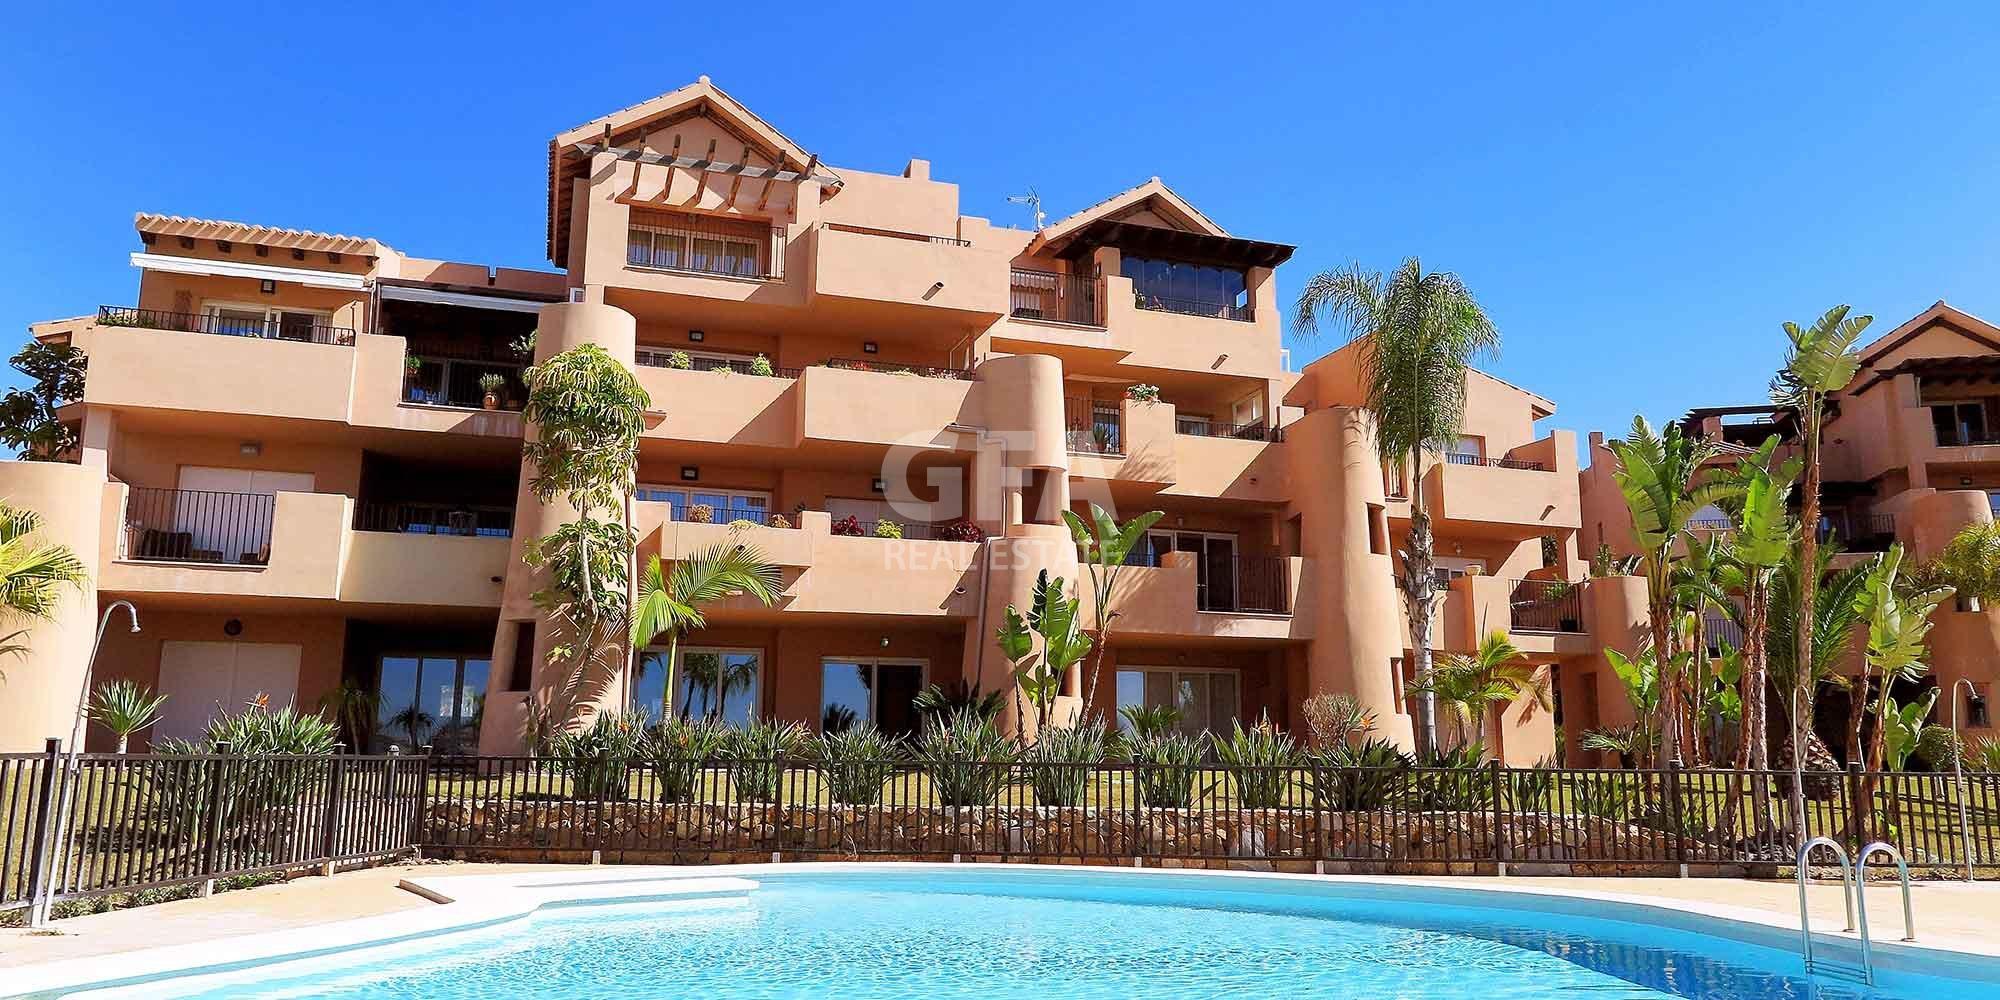 Residencial obra nueva Mar Menor Golf Resort fachada desde piscina